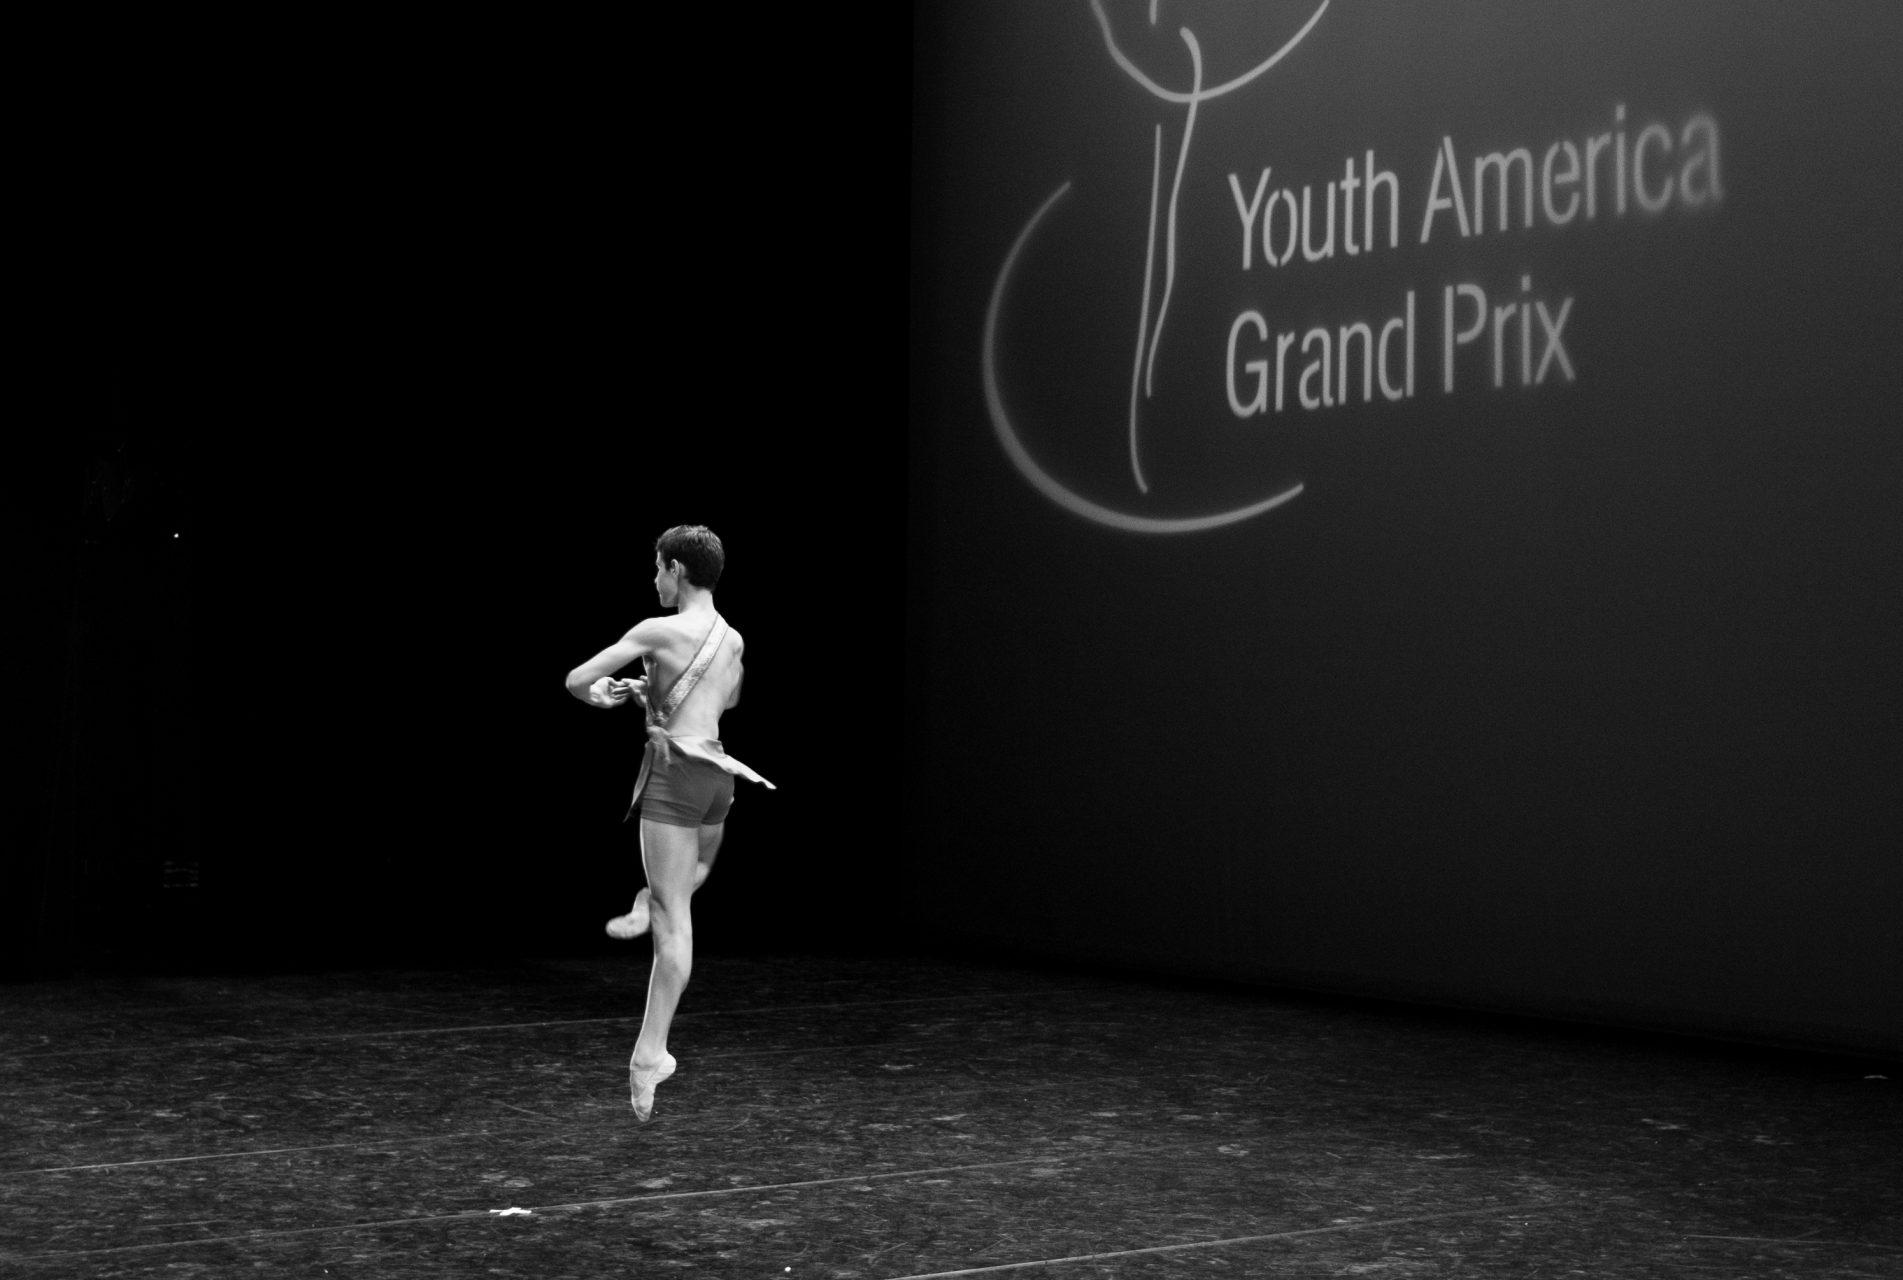 Youth America Grand Prix - 2018